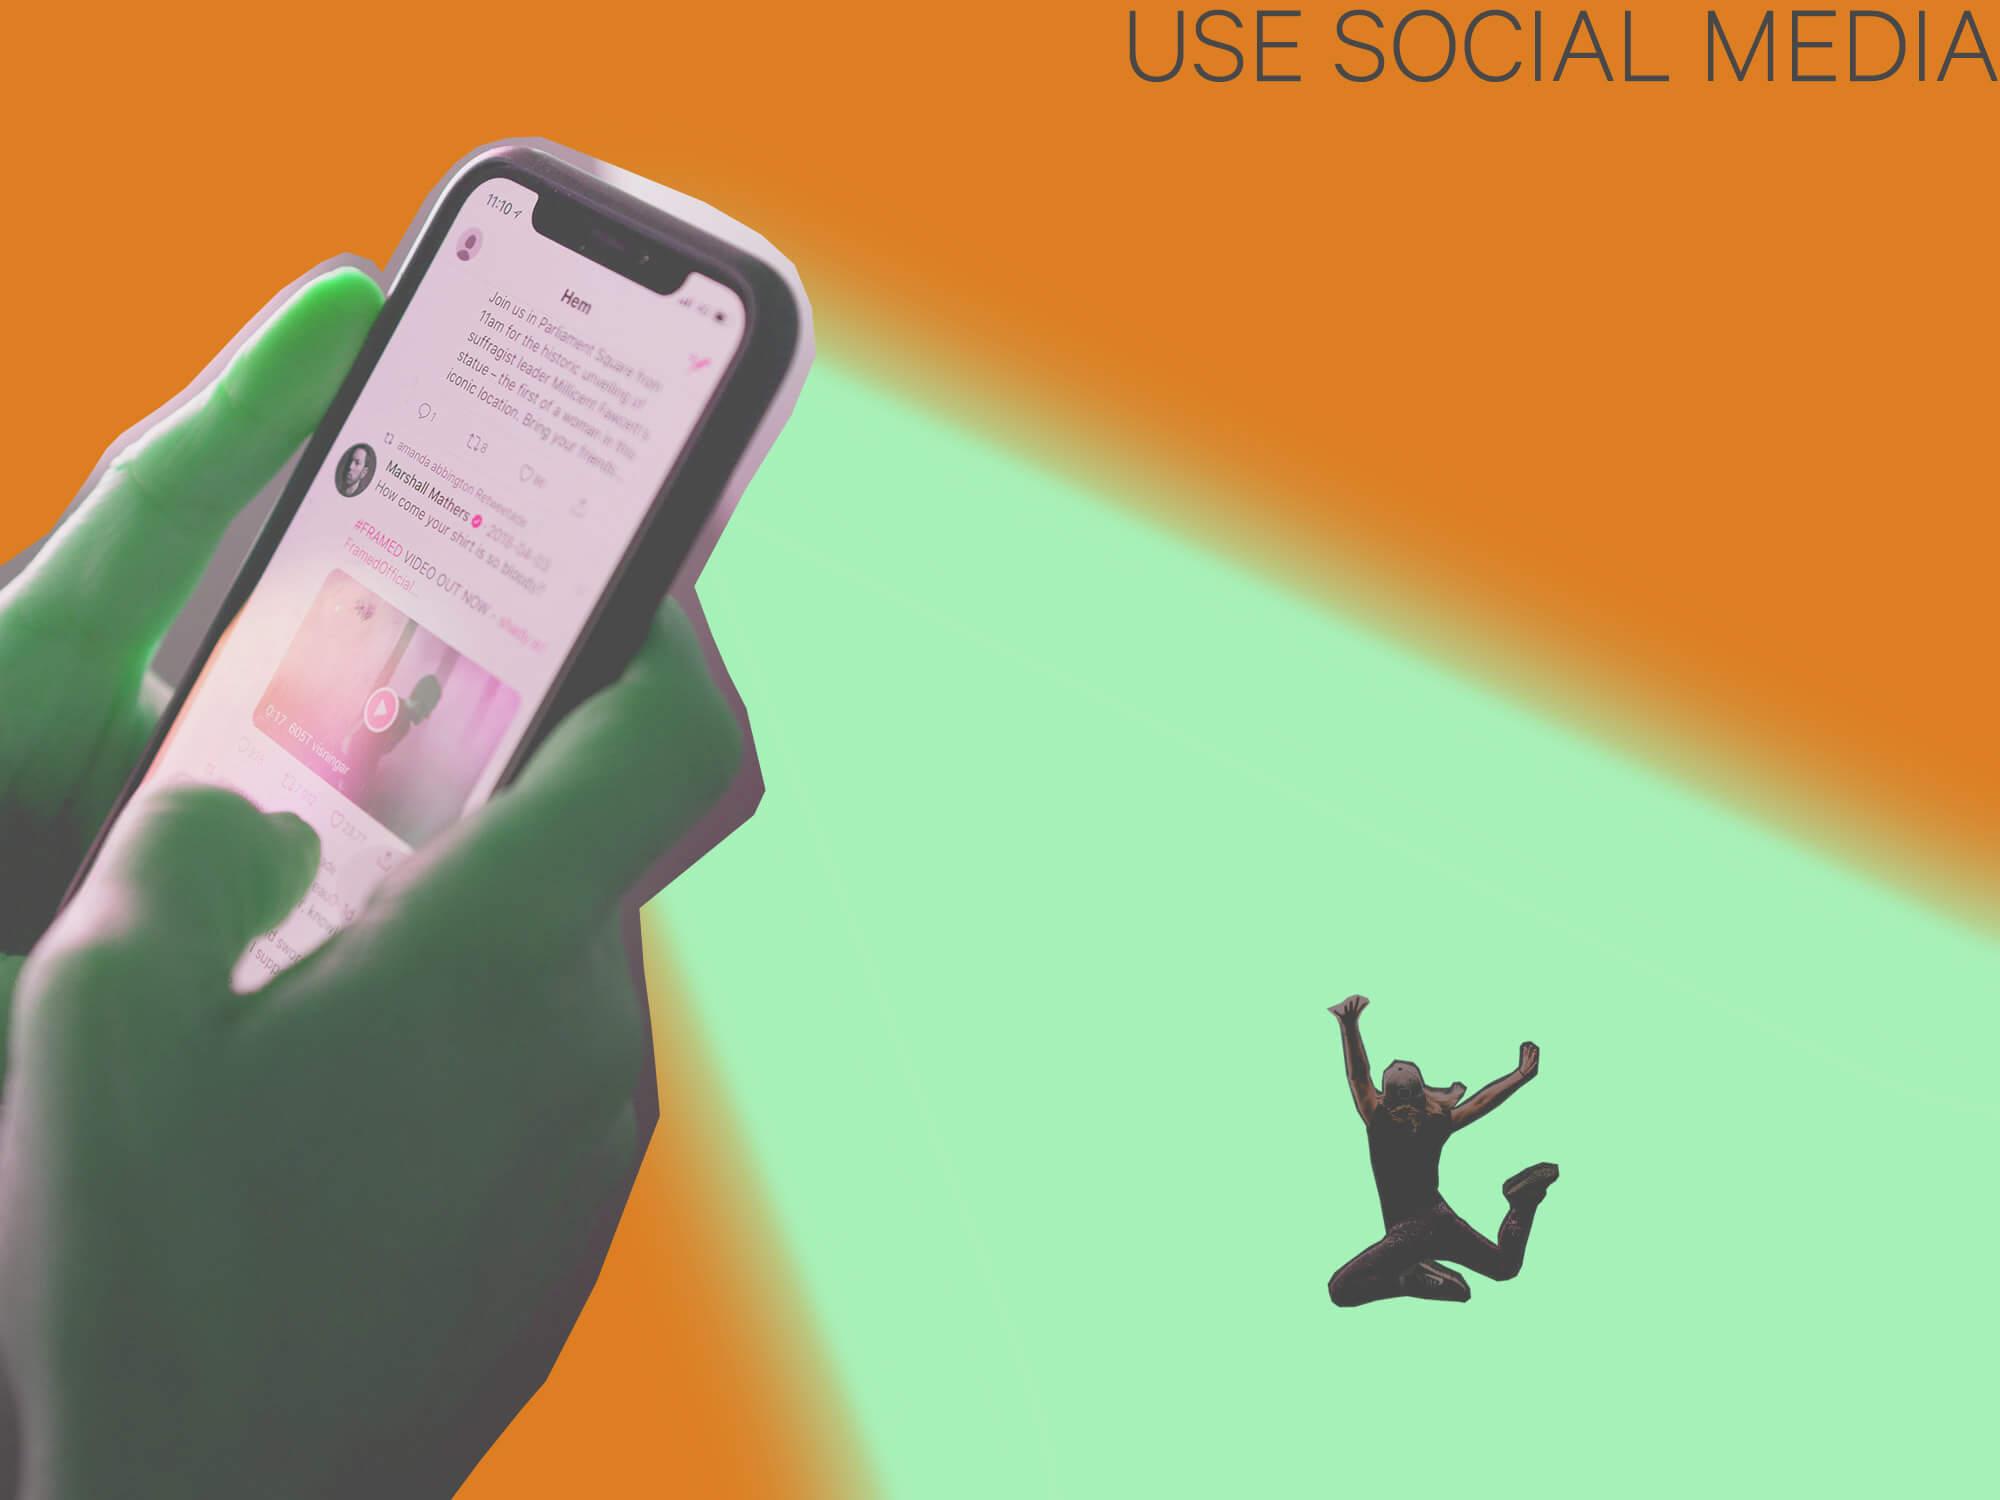 Get More Freelance Clients Using Social Media - Use Social Media